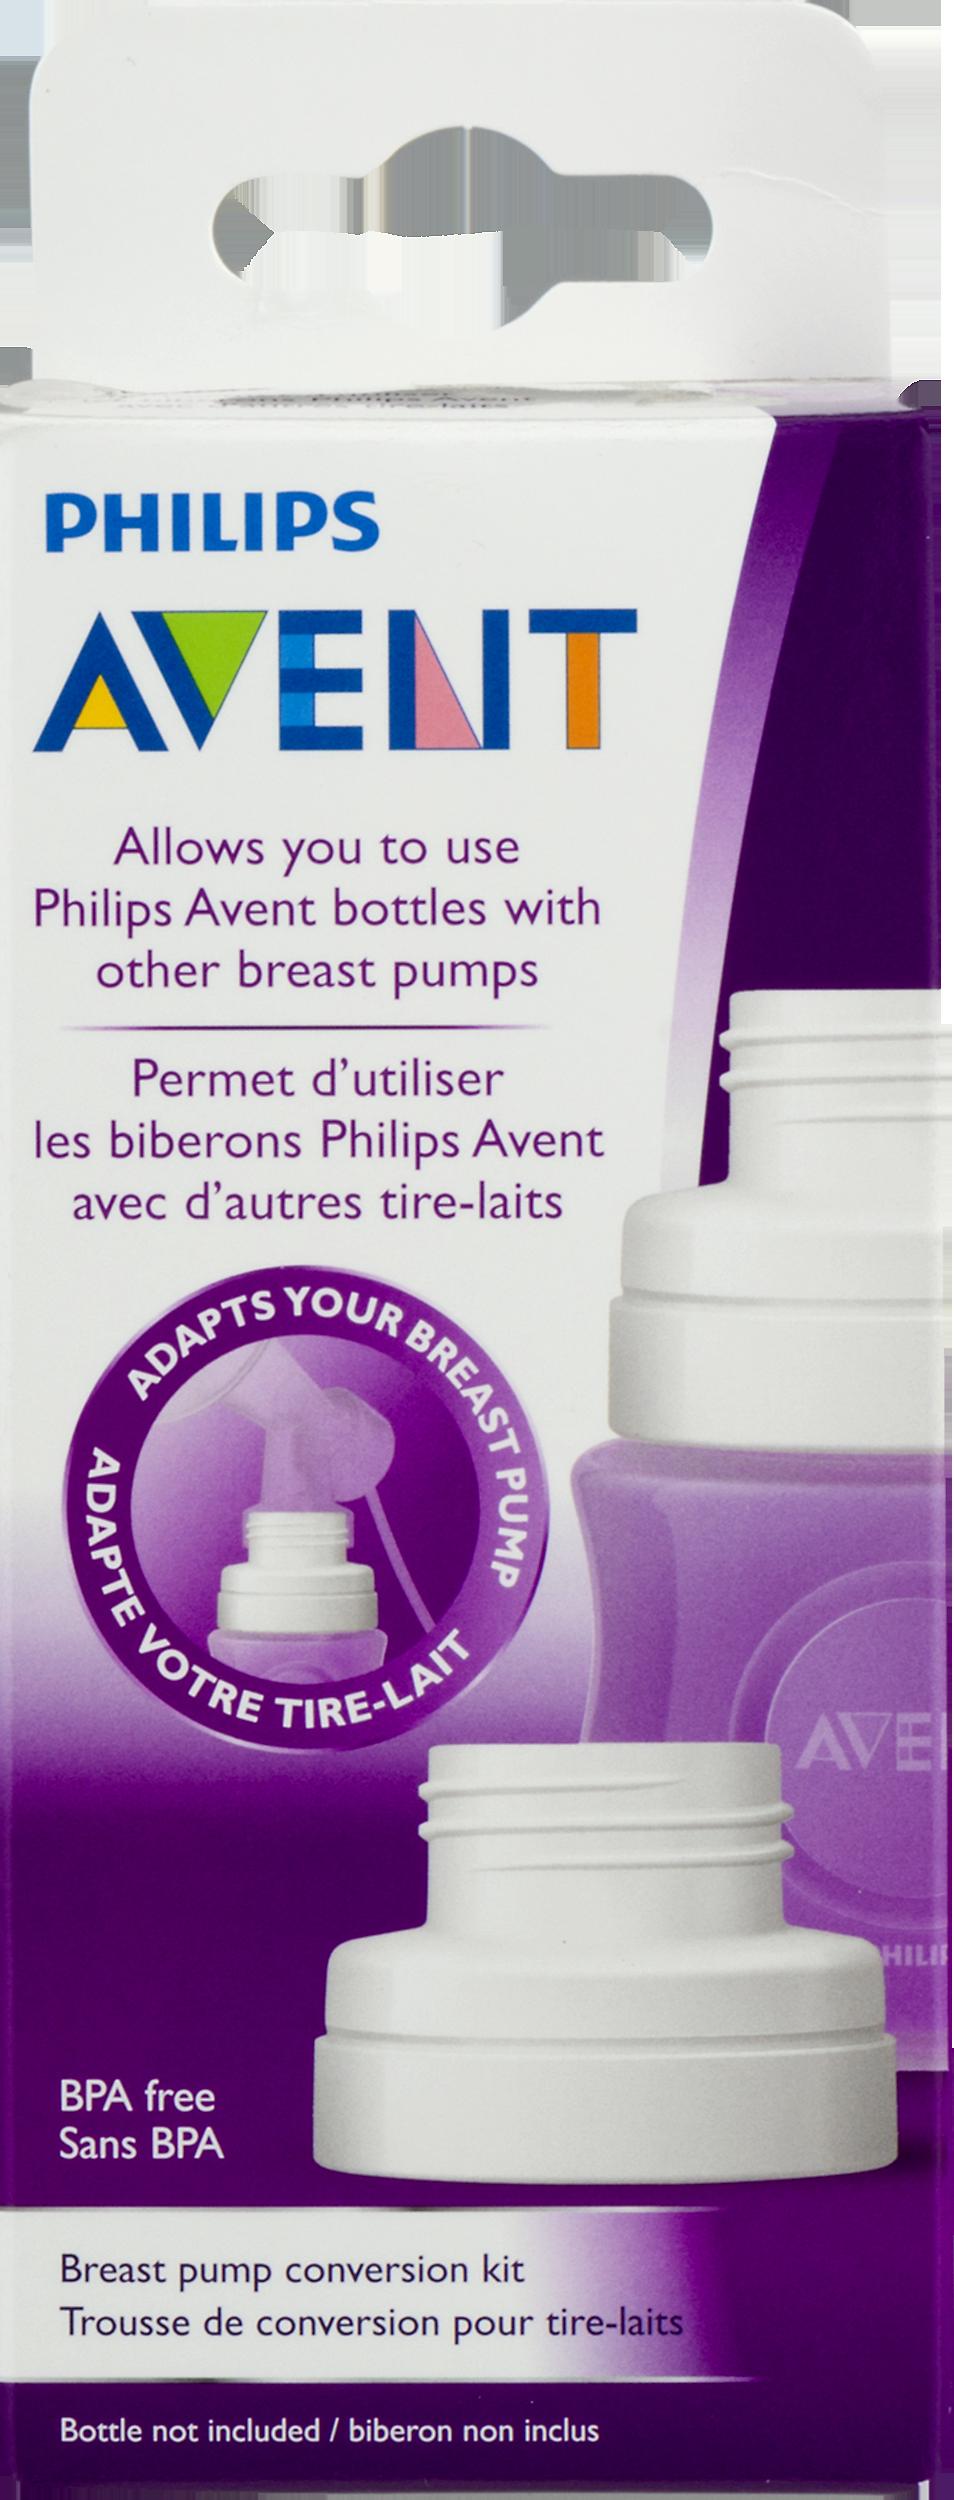 Philips avent breast pump. Dishwasher clipart bottle sterilizer